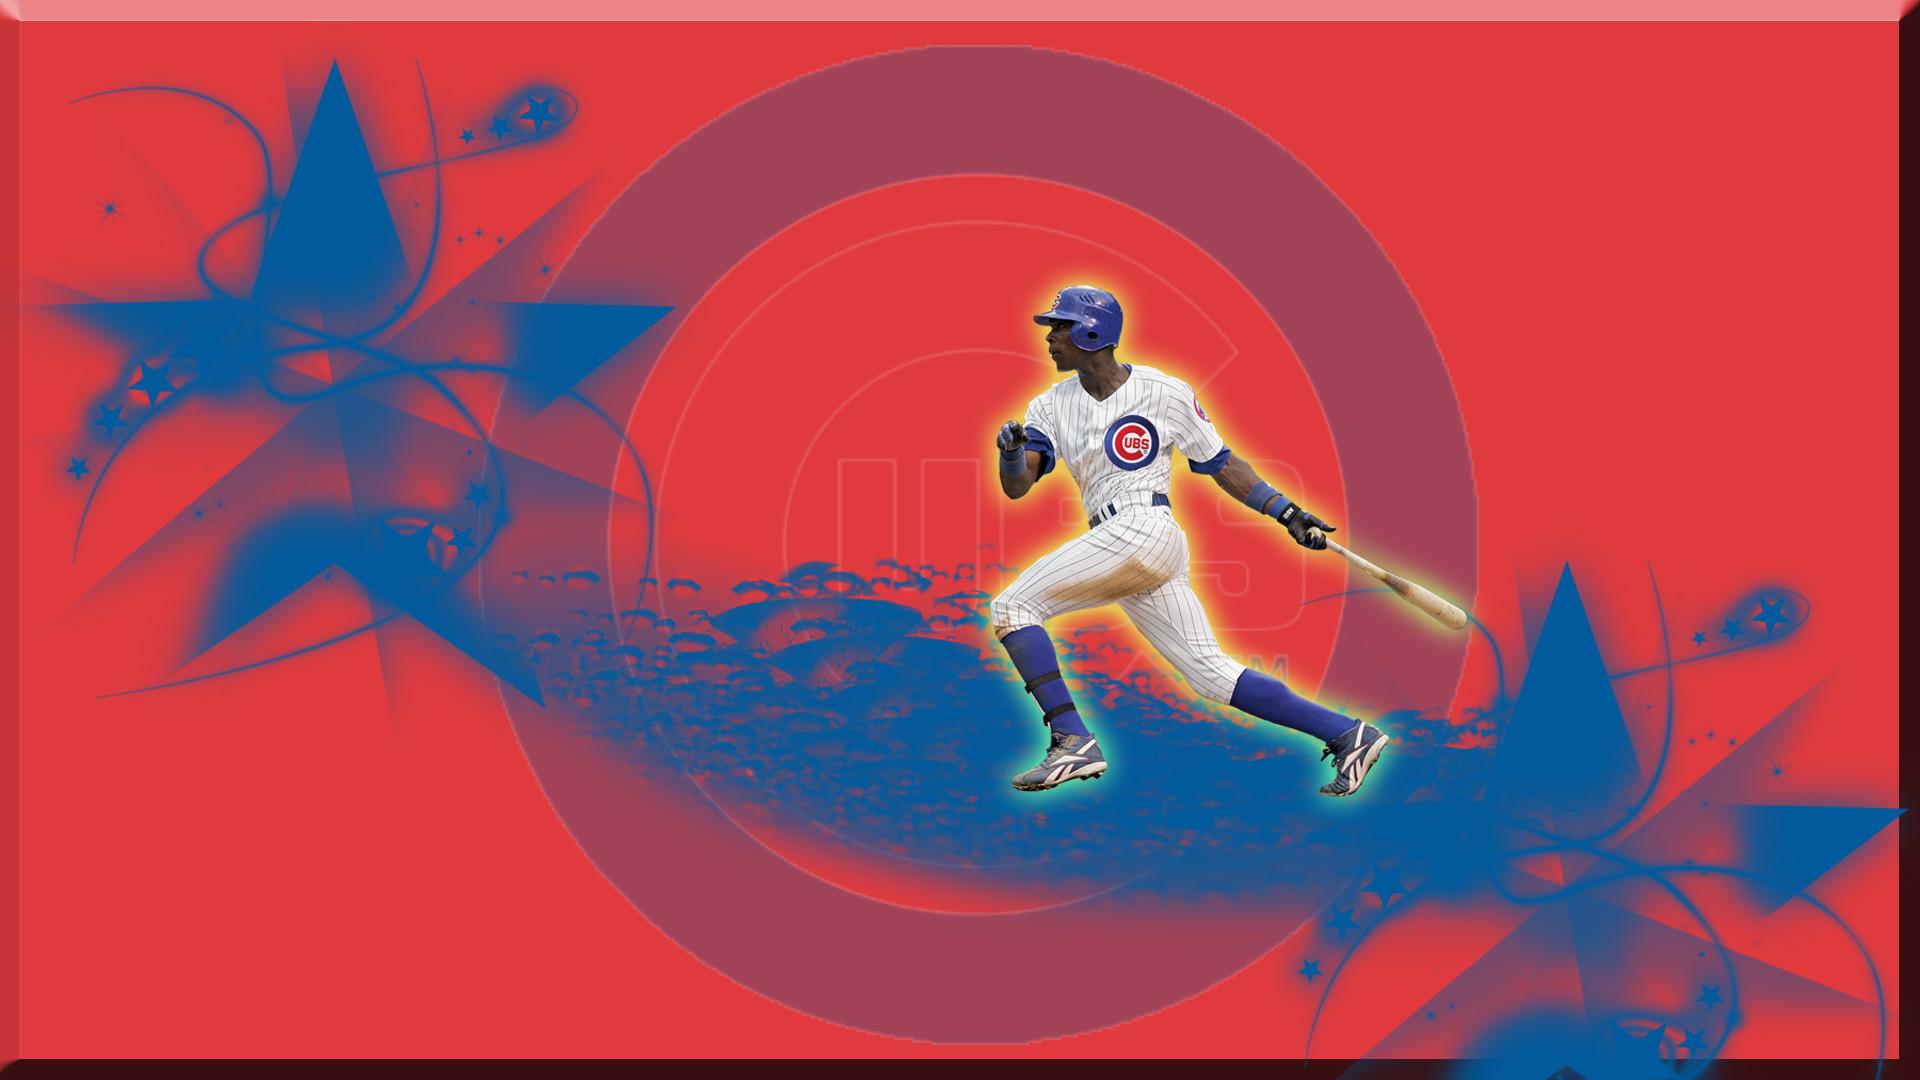 Baseball, Chicago Cubs Mlb Brand Art, Chicago Cubs, Sports, Mlb